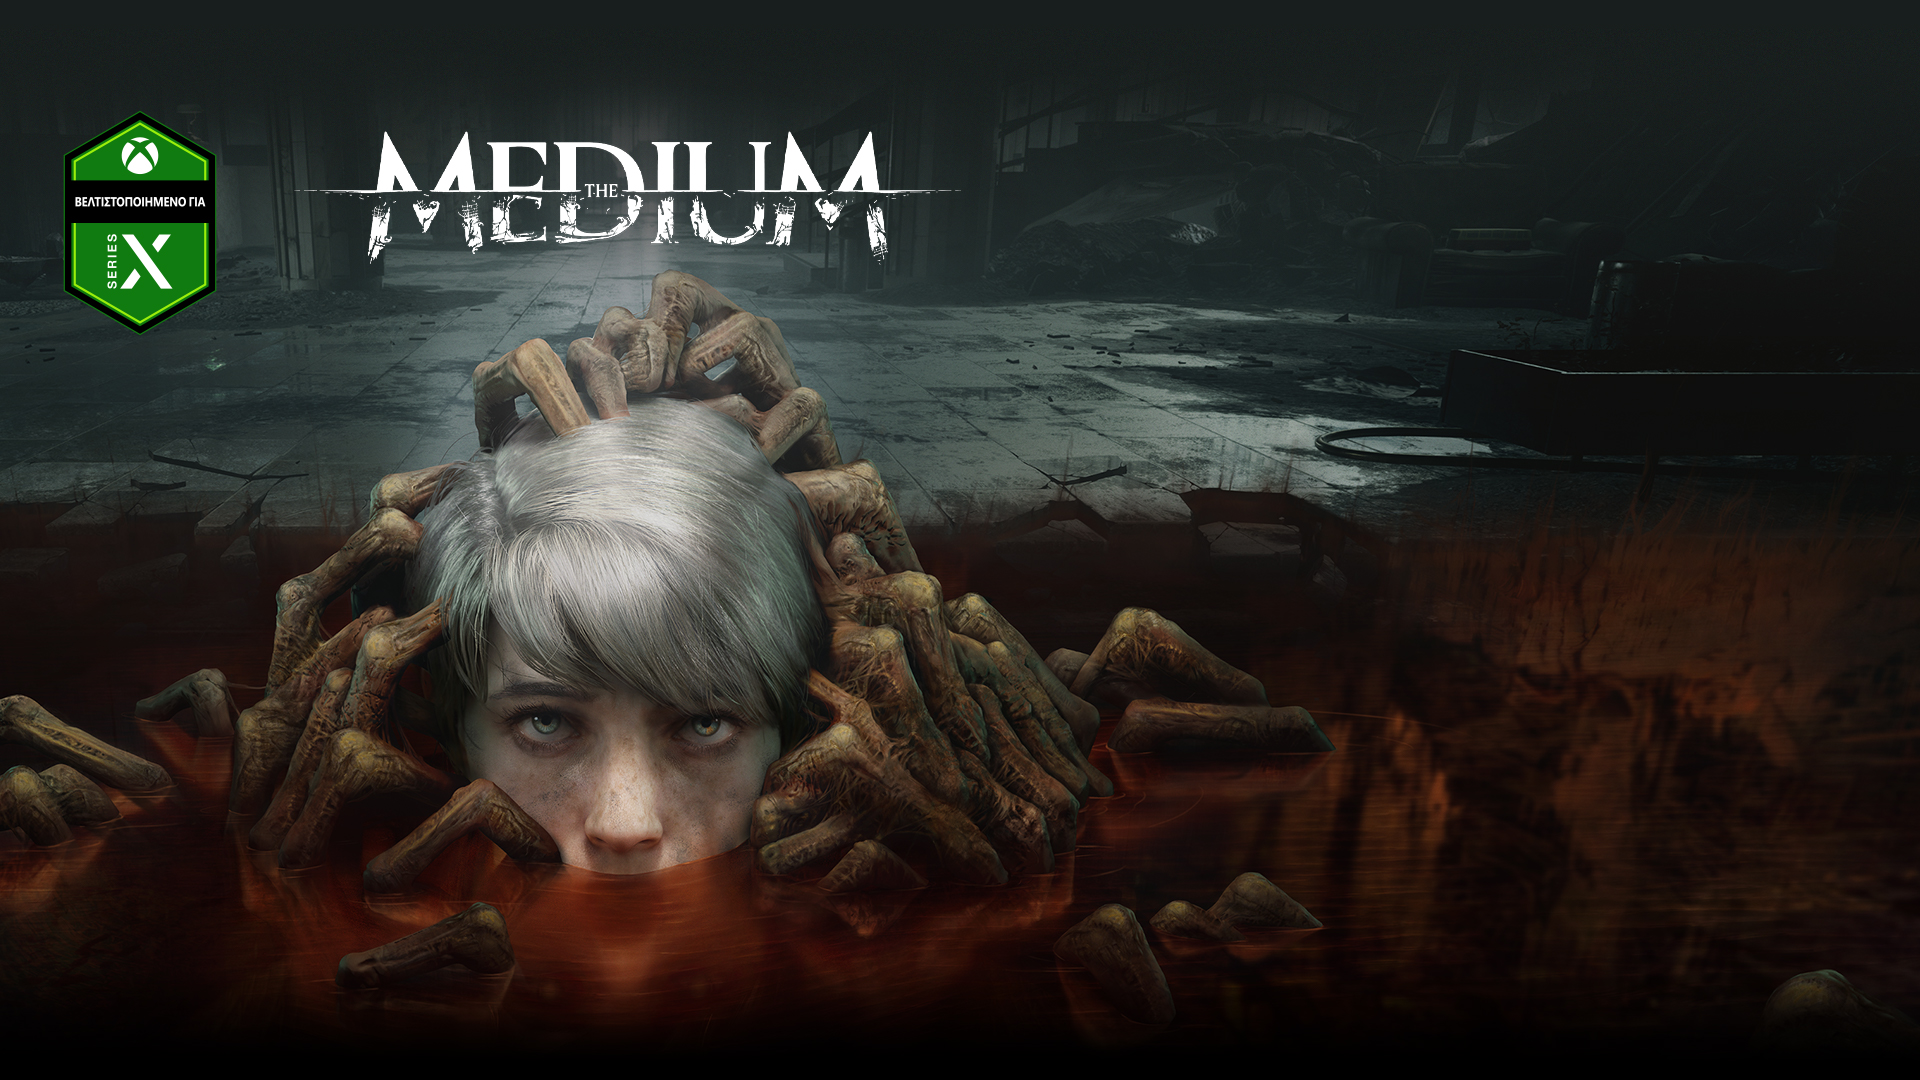 The Medium, Βελτιστοποιημένο για Series X, το κεφάλι ενός παιδιού εμφανίζεται από έναν λάκκο με χέρια απέθαντων.